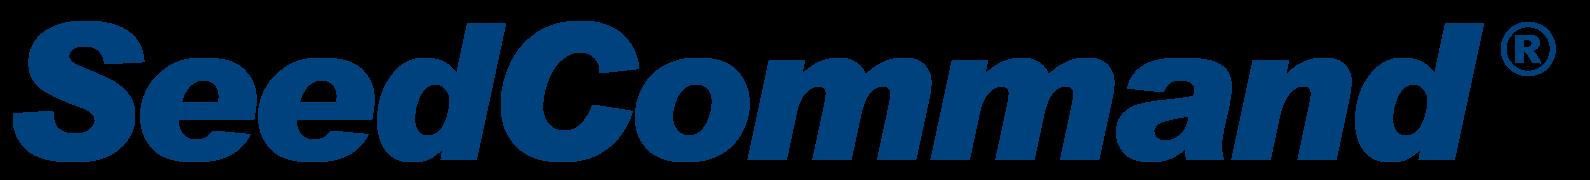 seed command logo